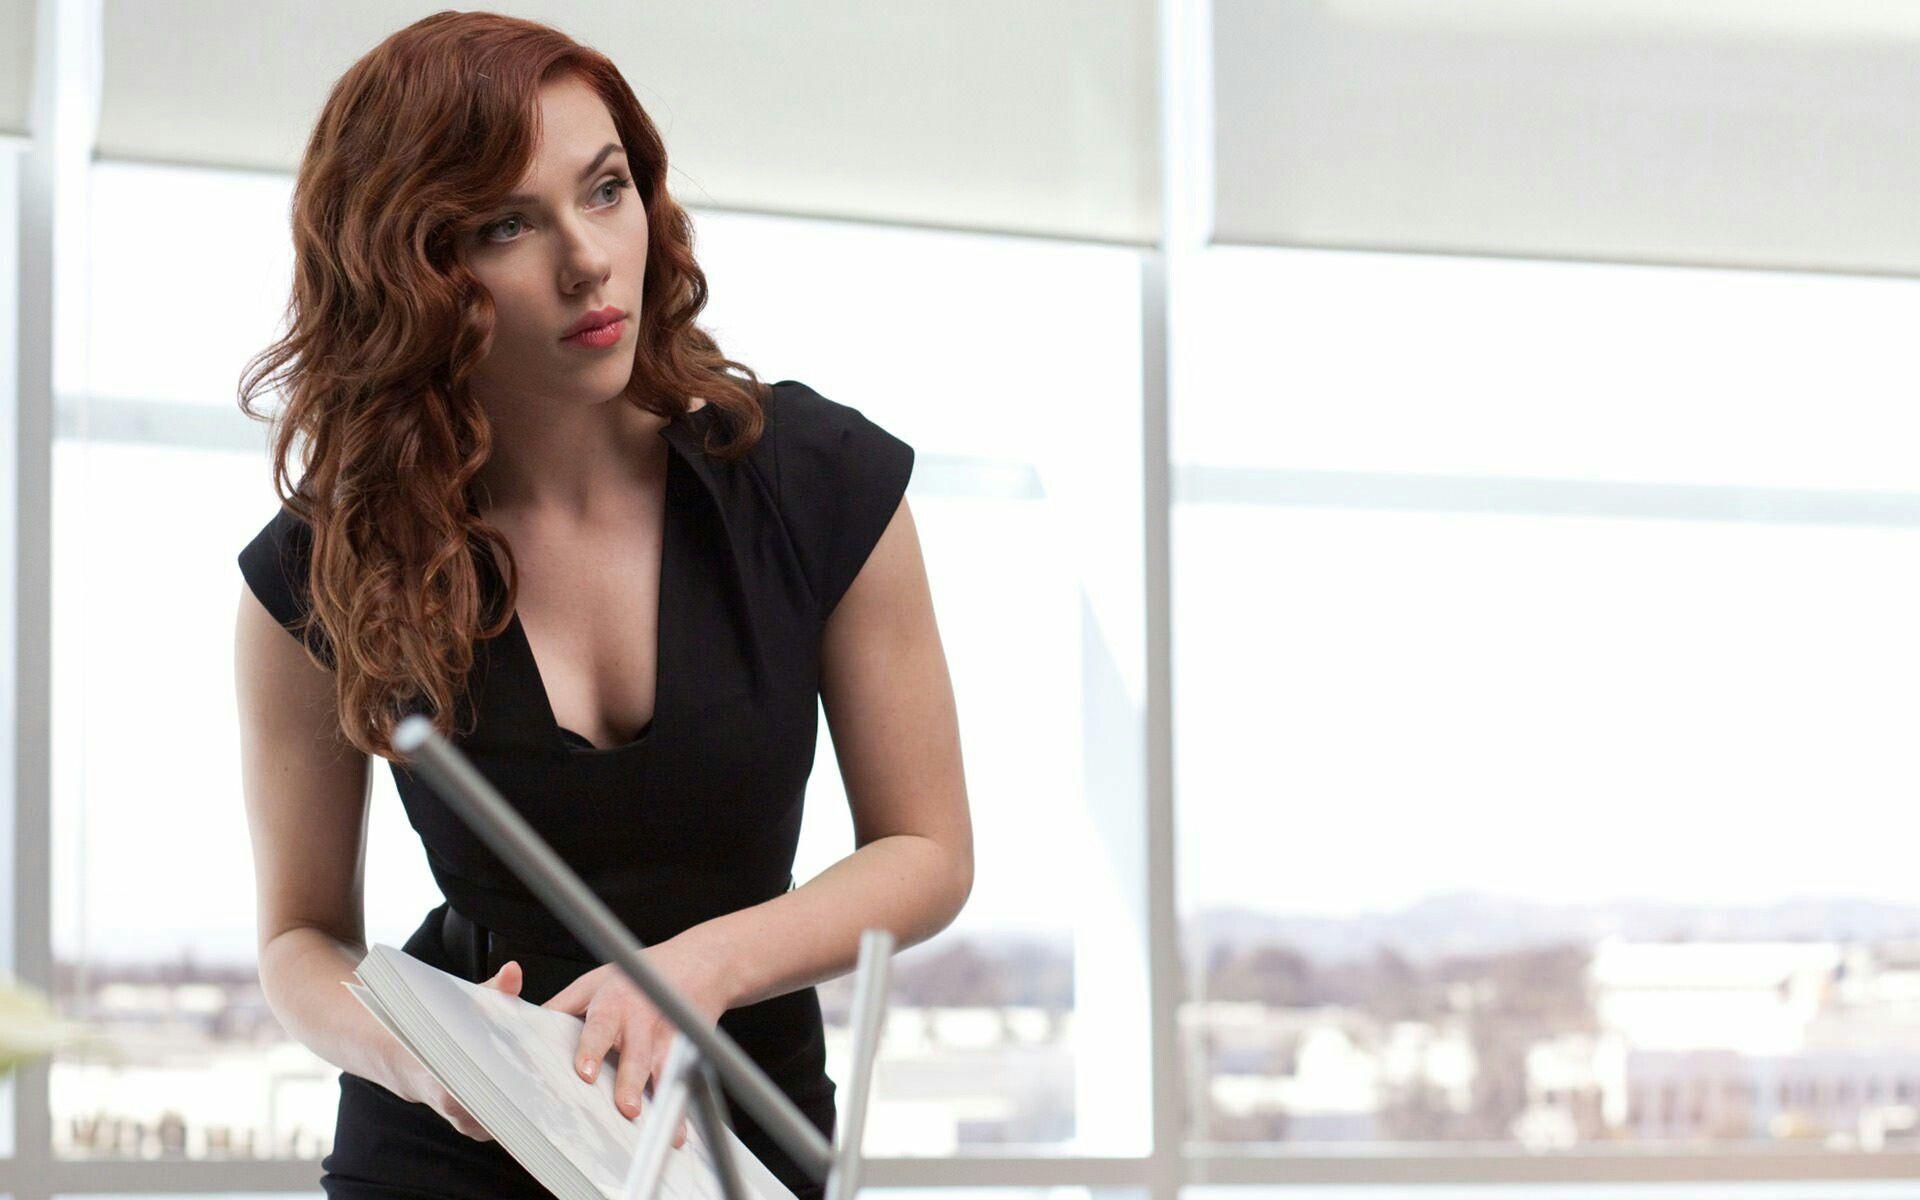 Pin By Megan Johnson On Hot Girls Scarlett Johansson